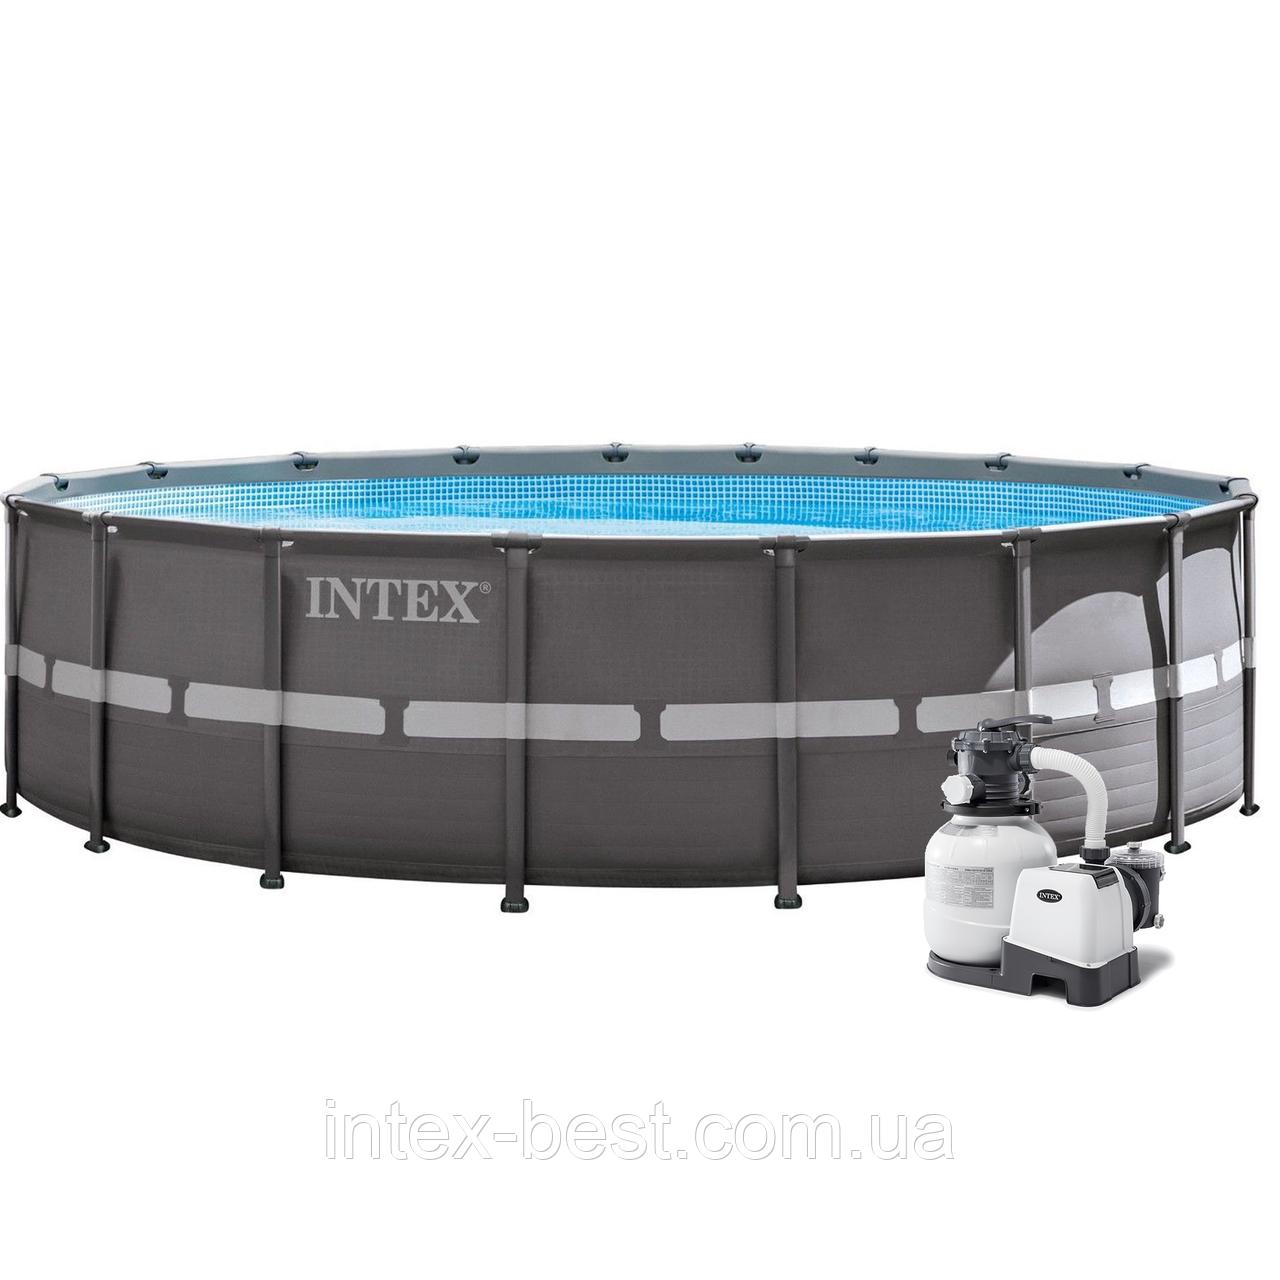 Intex 26330 - каркасный бассейн Ultra Frame XTR 549x132 см